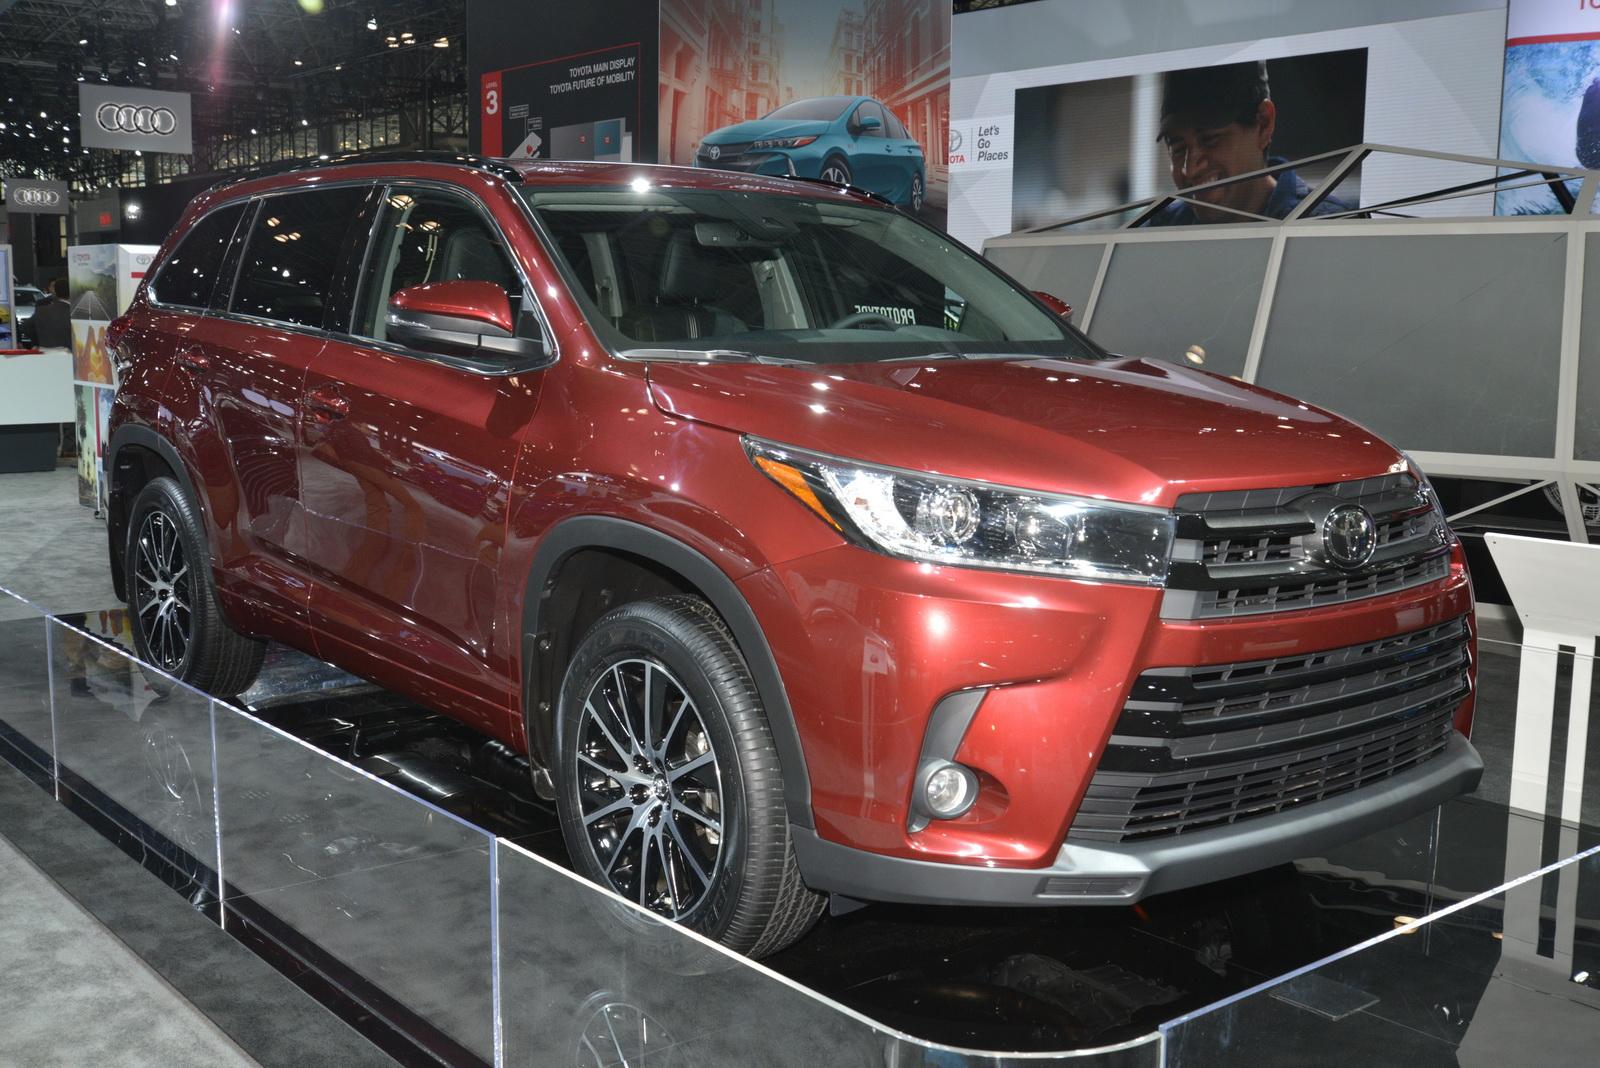 2016 Toyota Highlander Le >> Toyota Slaps A New Face On 2017 Highlander, Gives It More ...